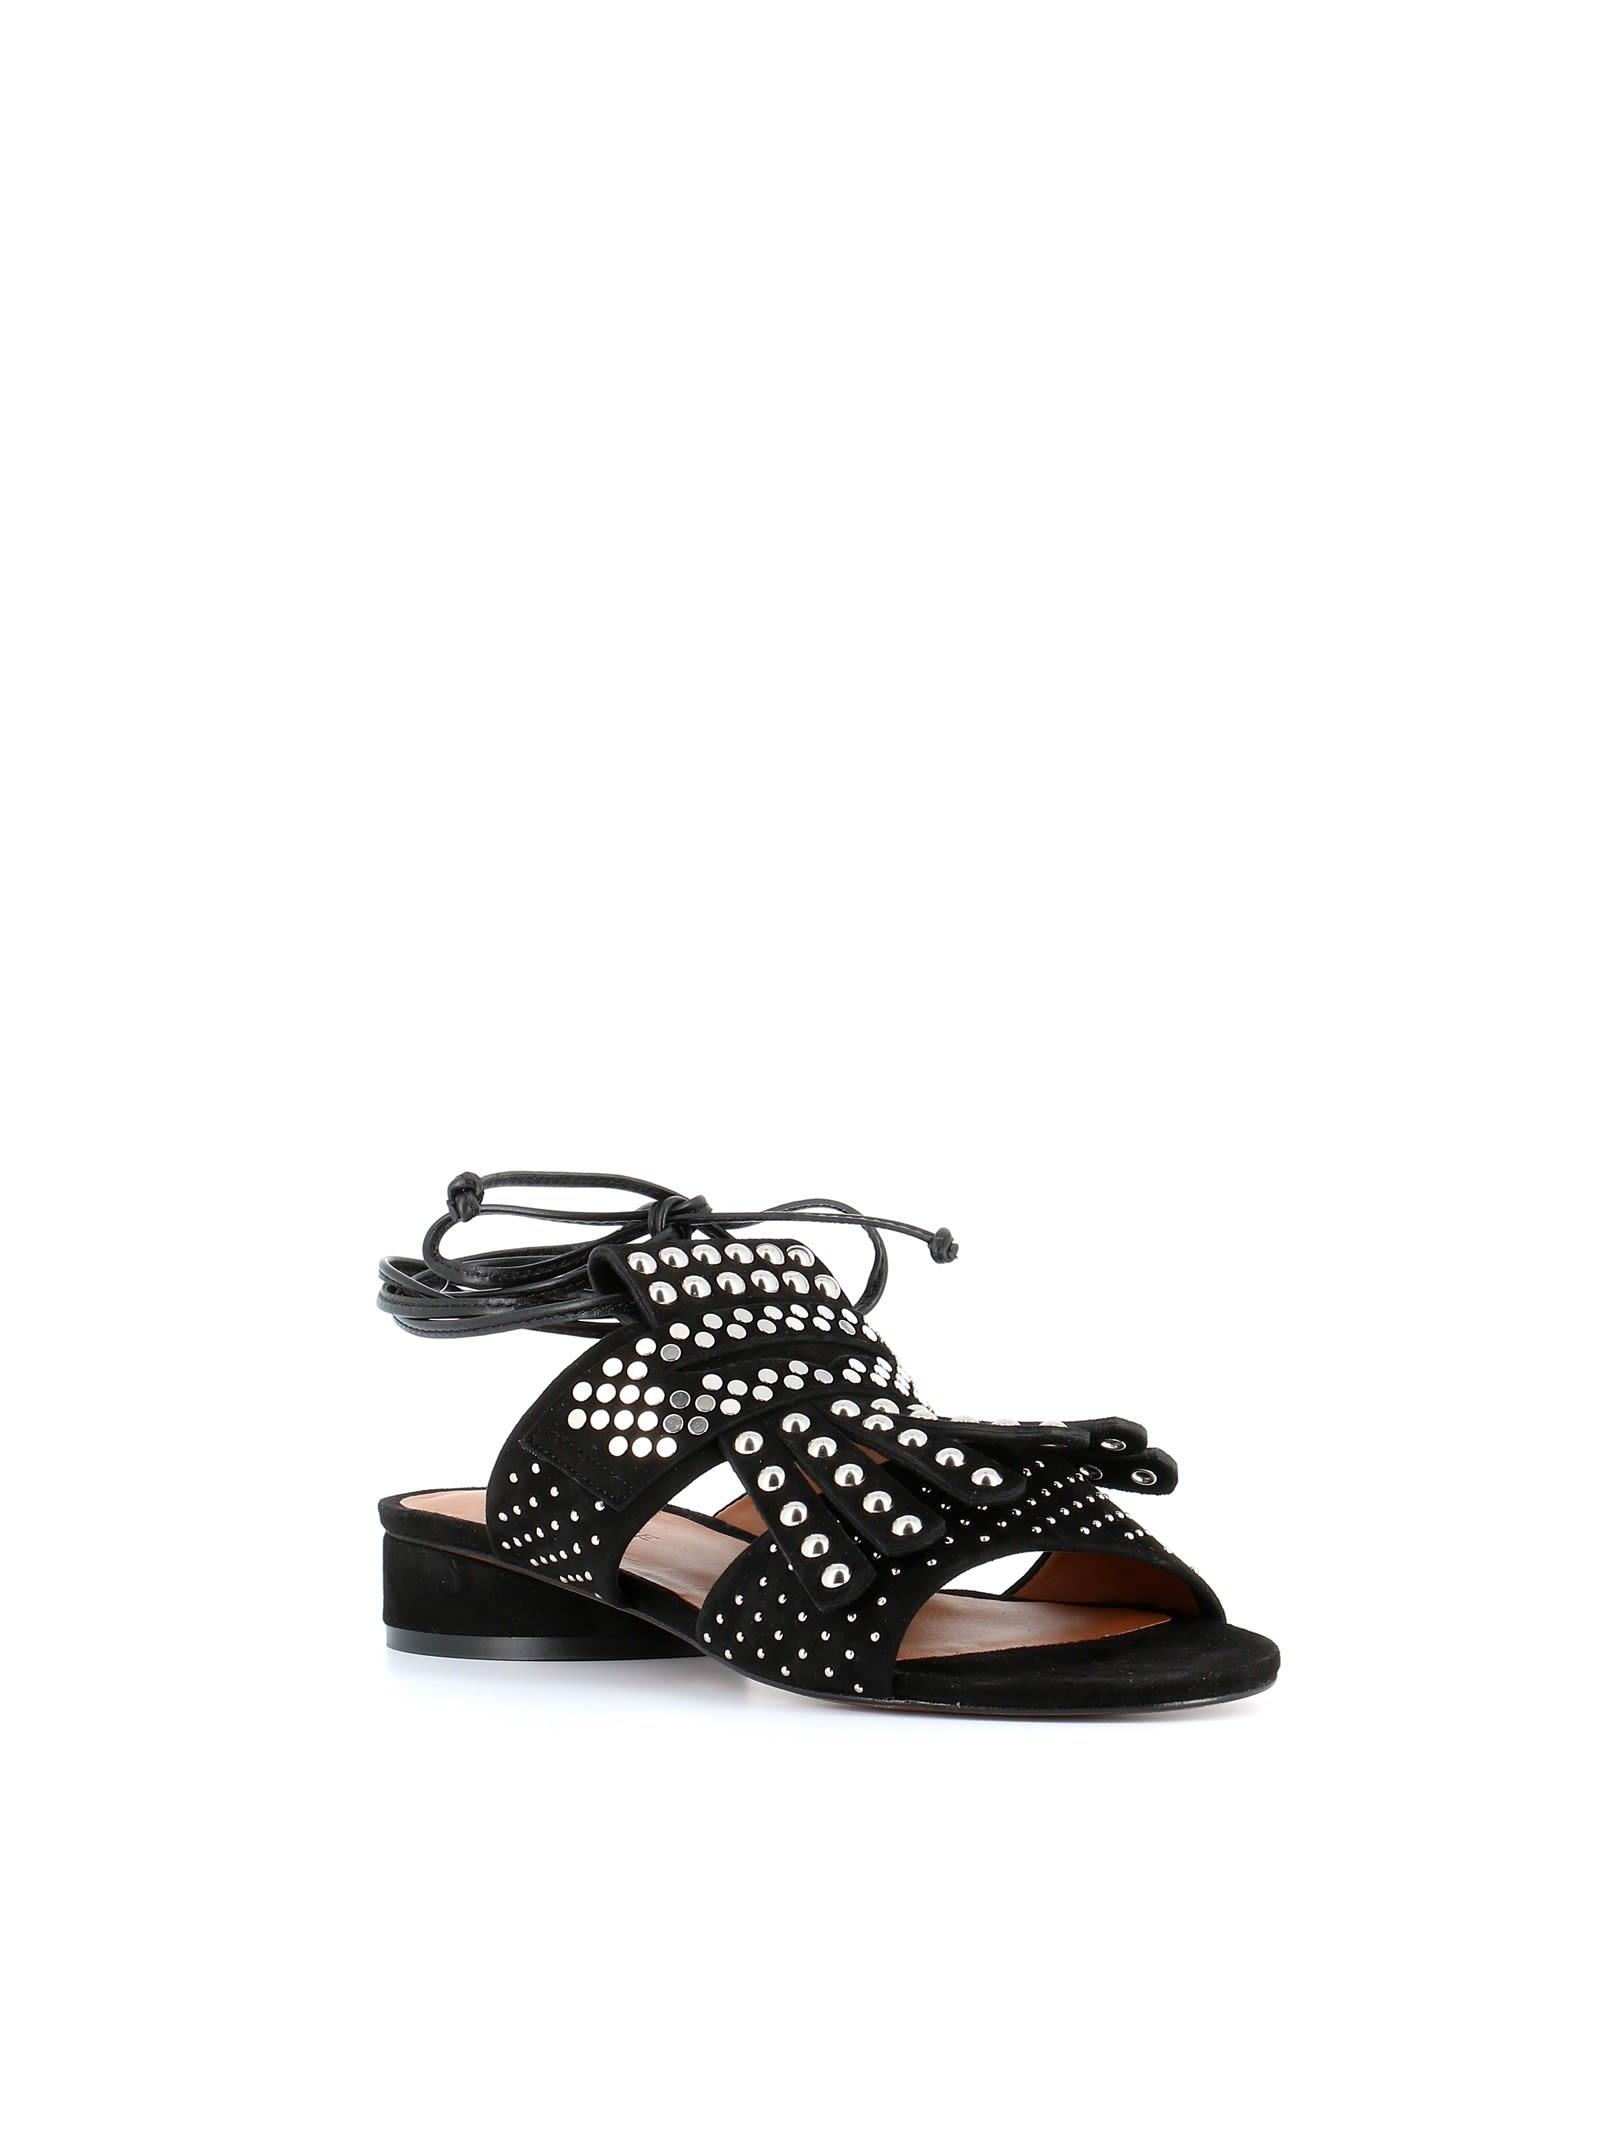 Robert Clergerie Figlouc sandals